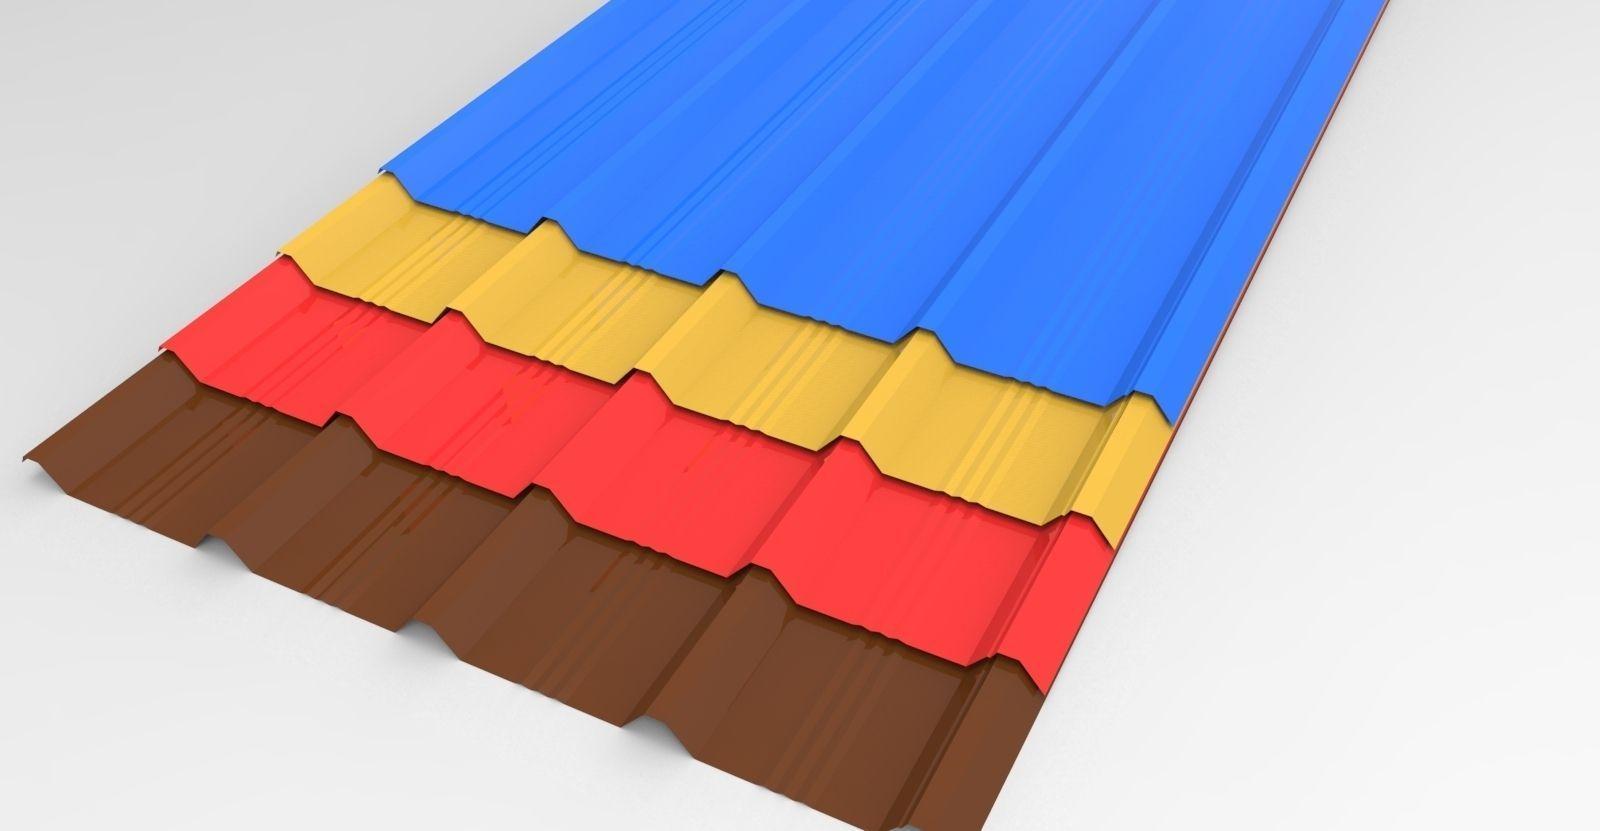 roofing sheets 3d model sldprt sldasm slddrw 1 ... & 3D model roofing sheets | CGTrader memphite.com